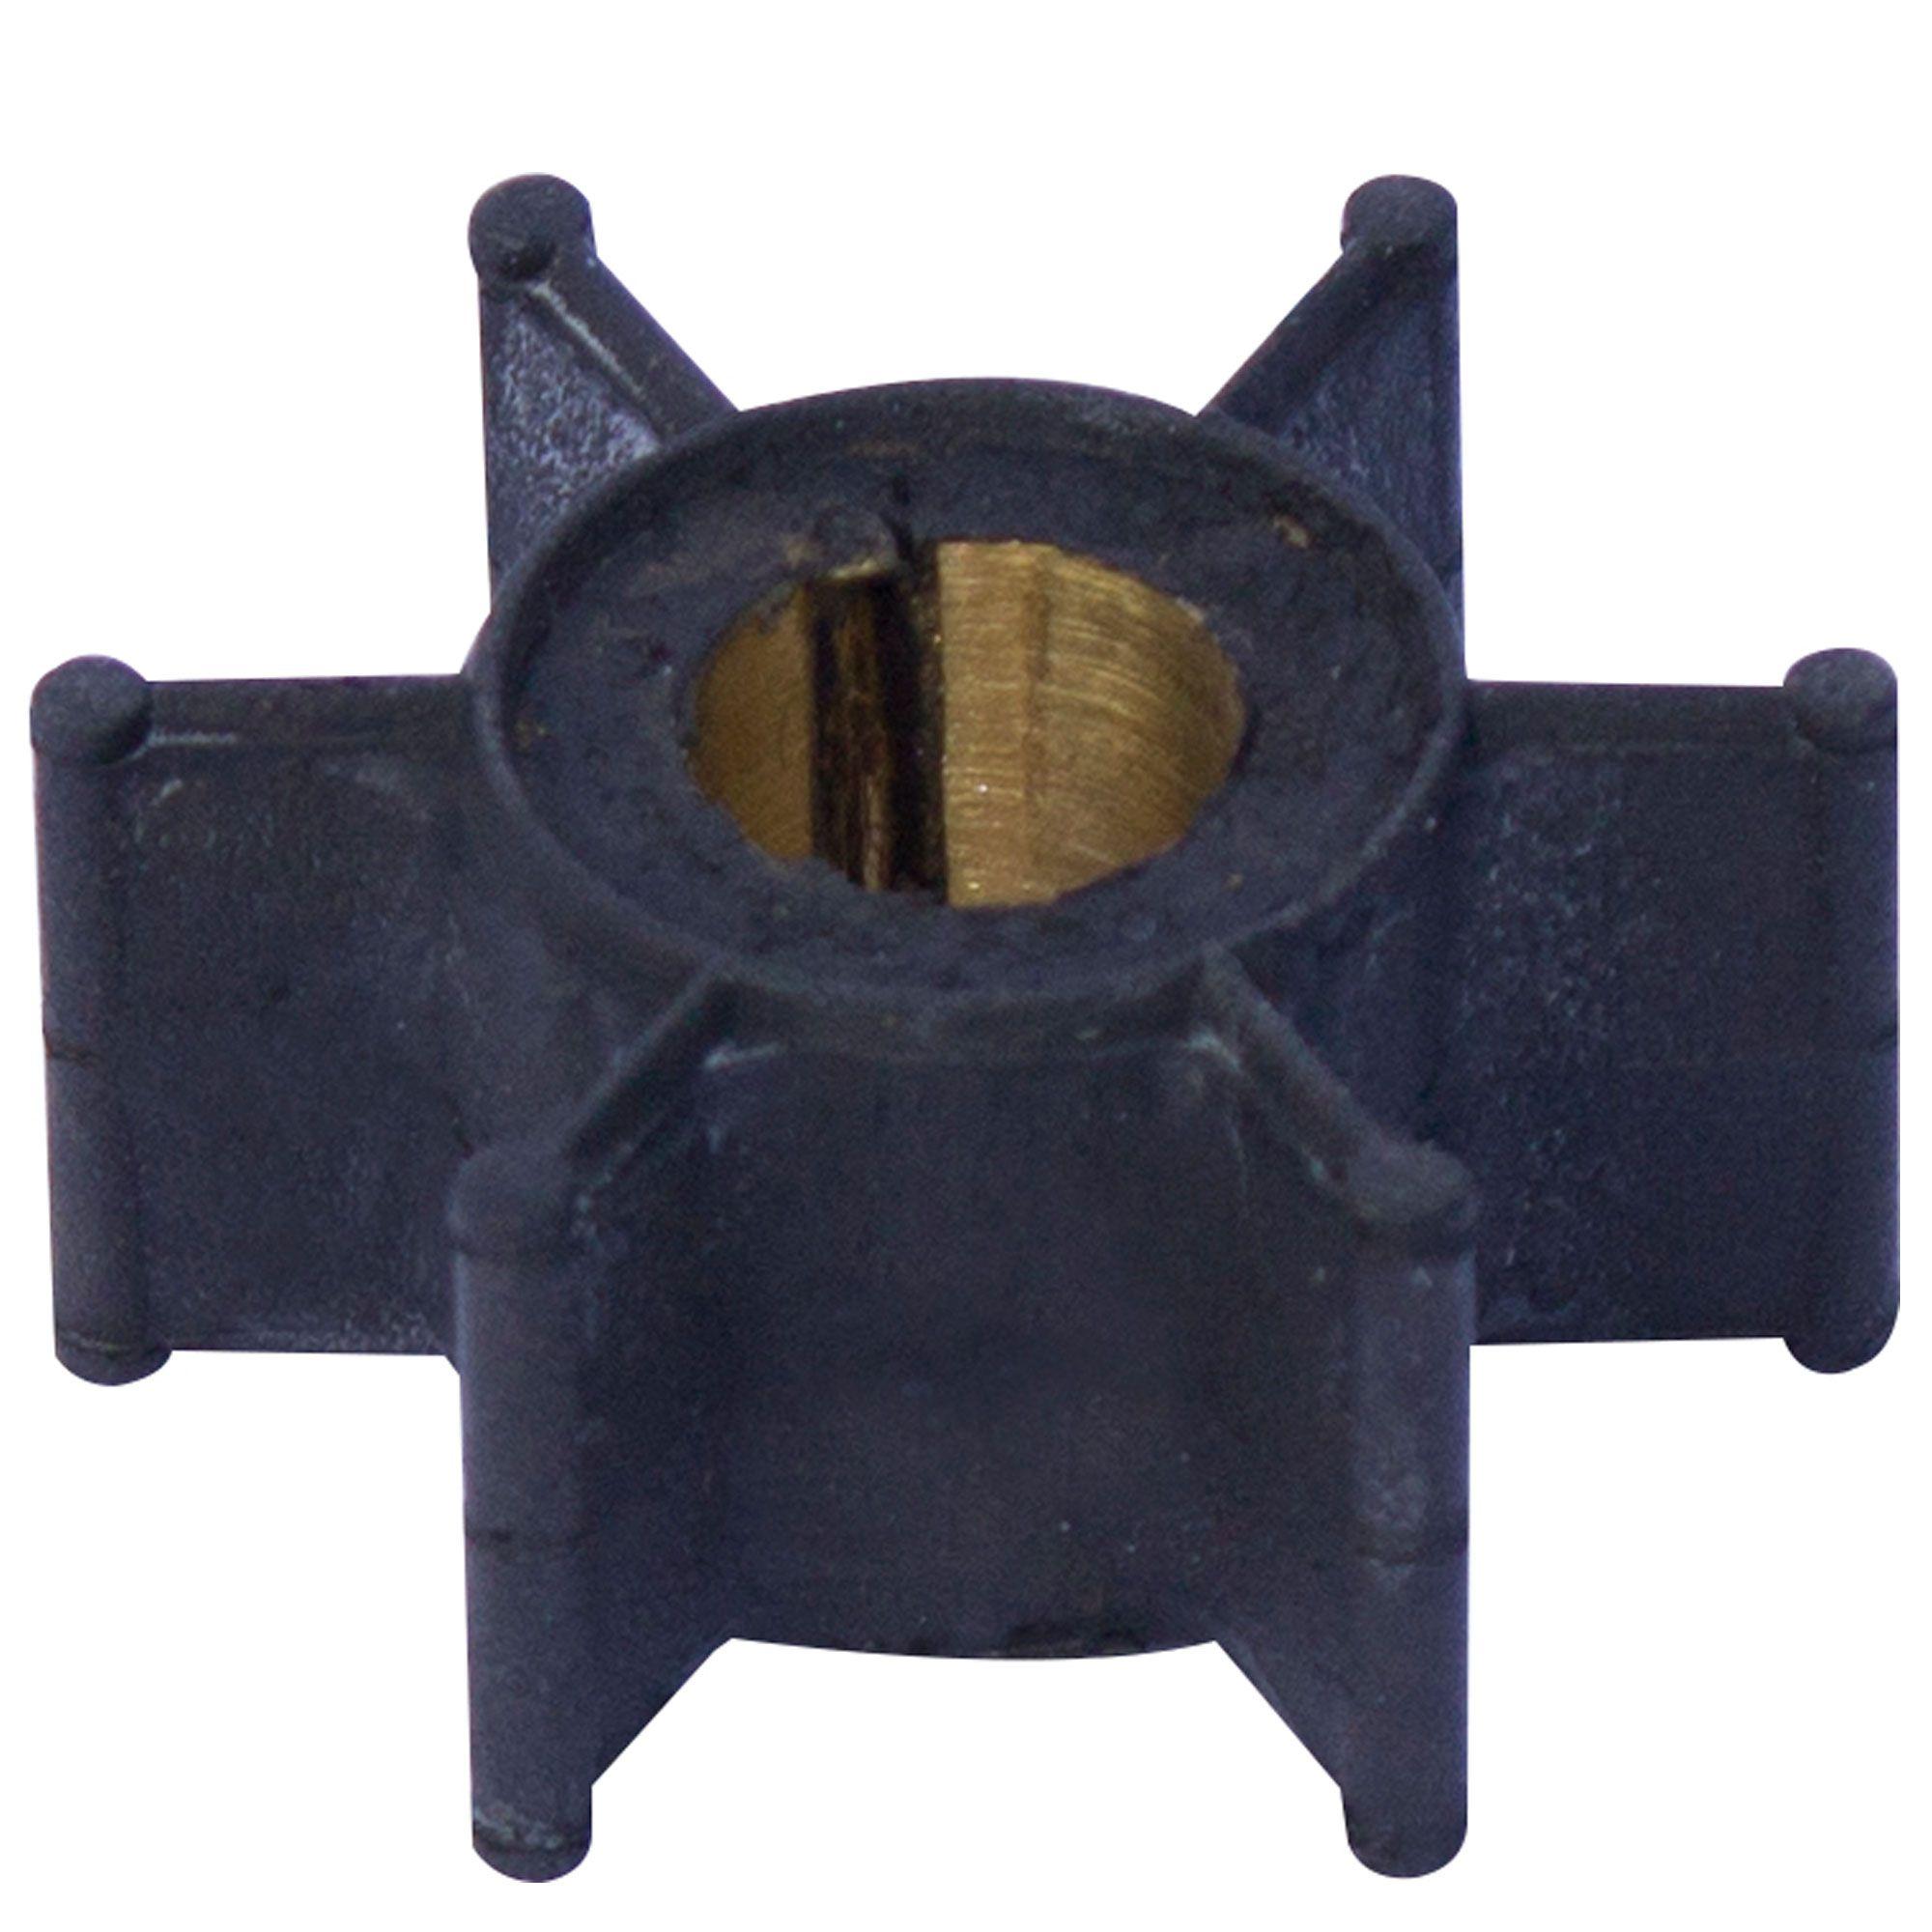 Rotor 40 x 14 x 22mm